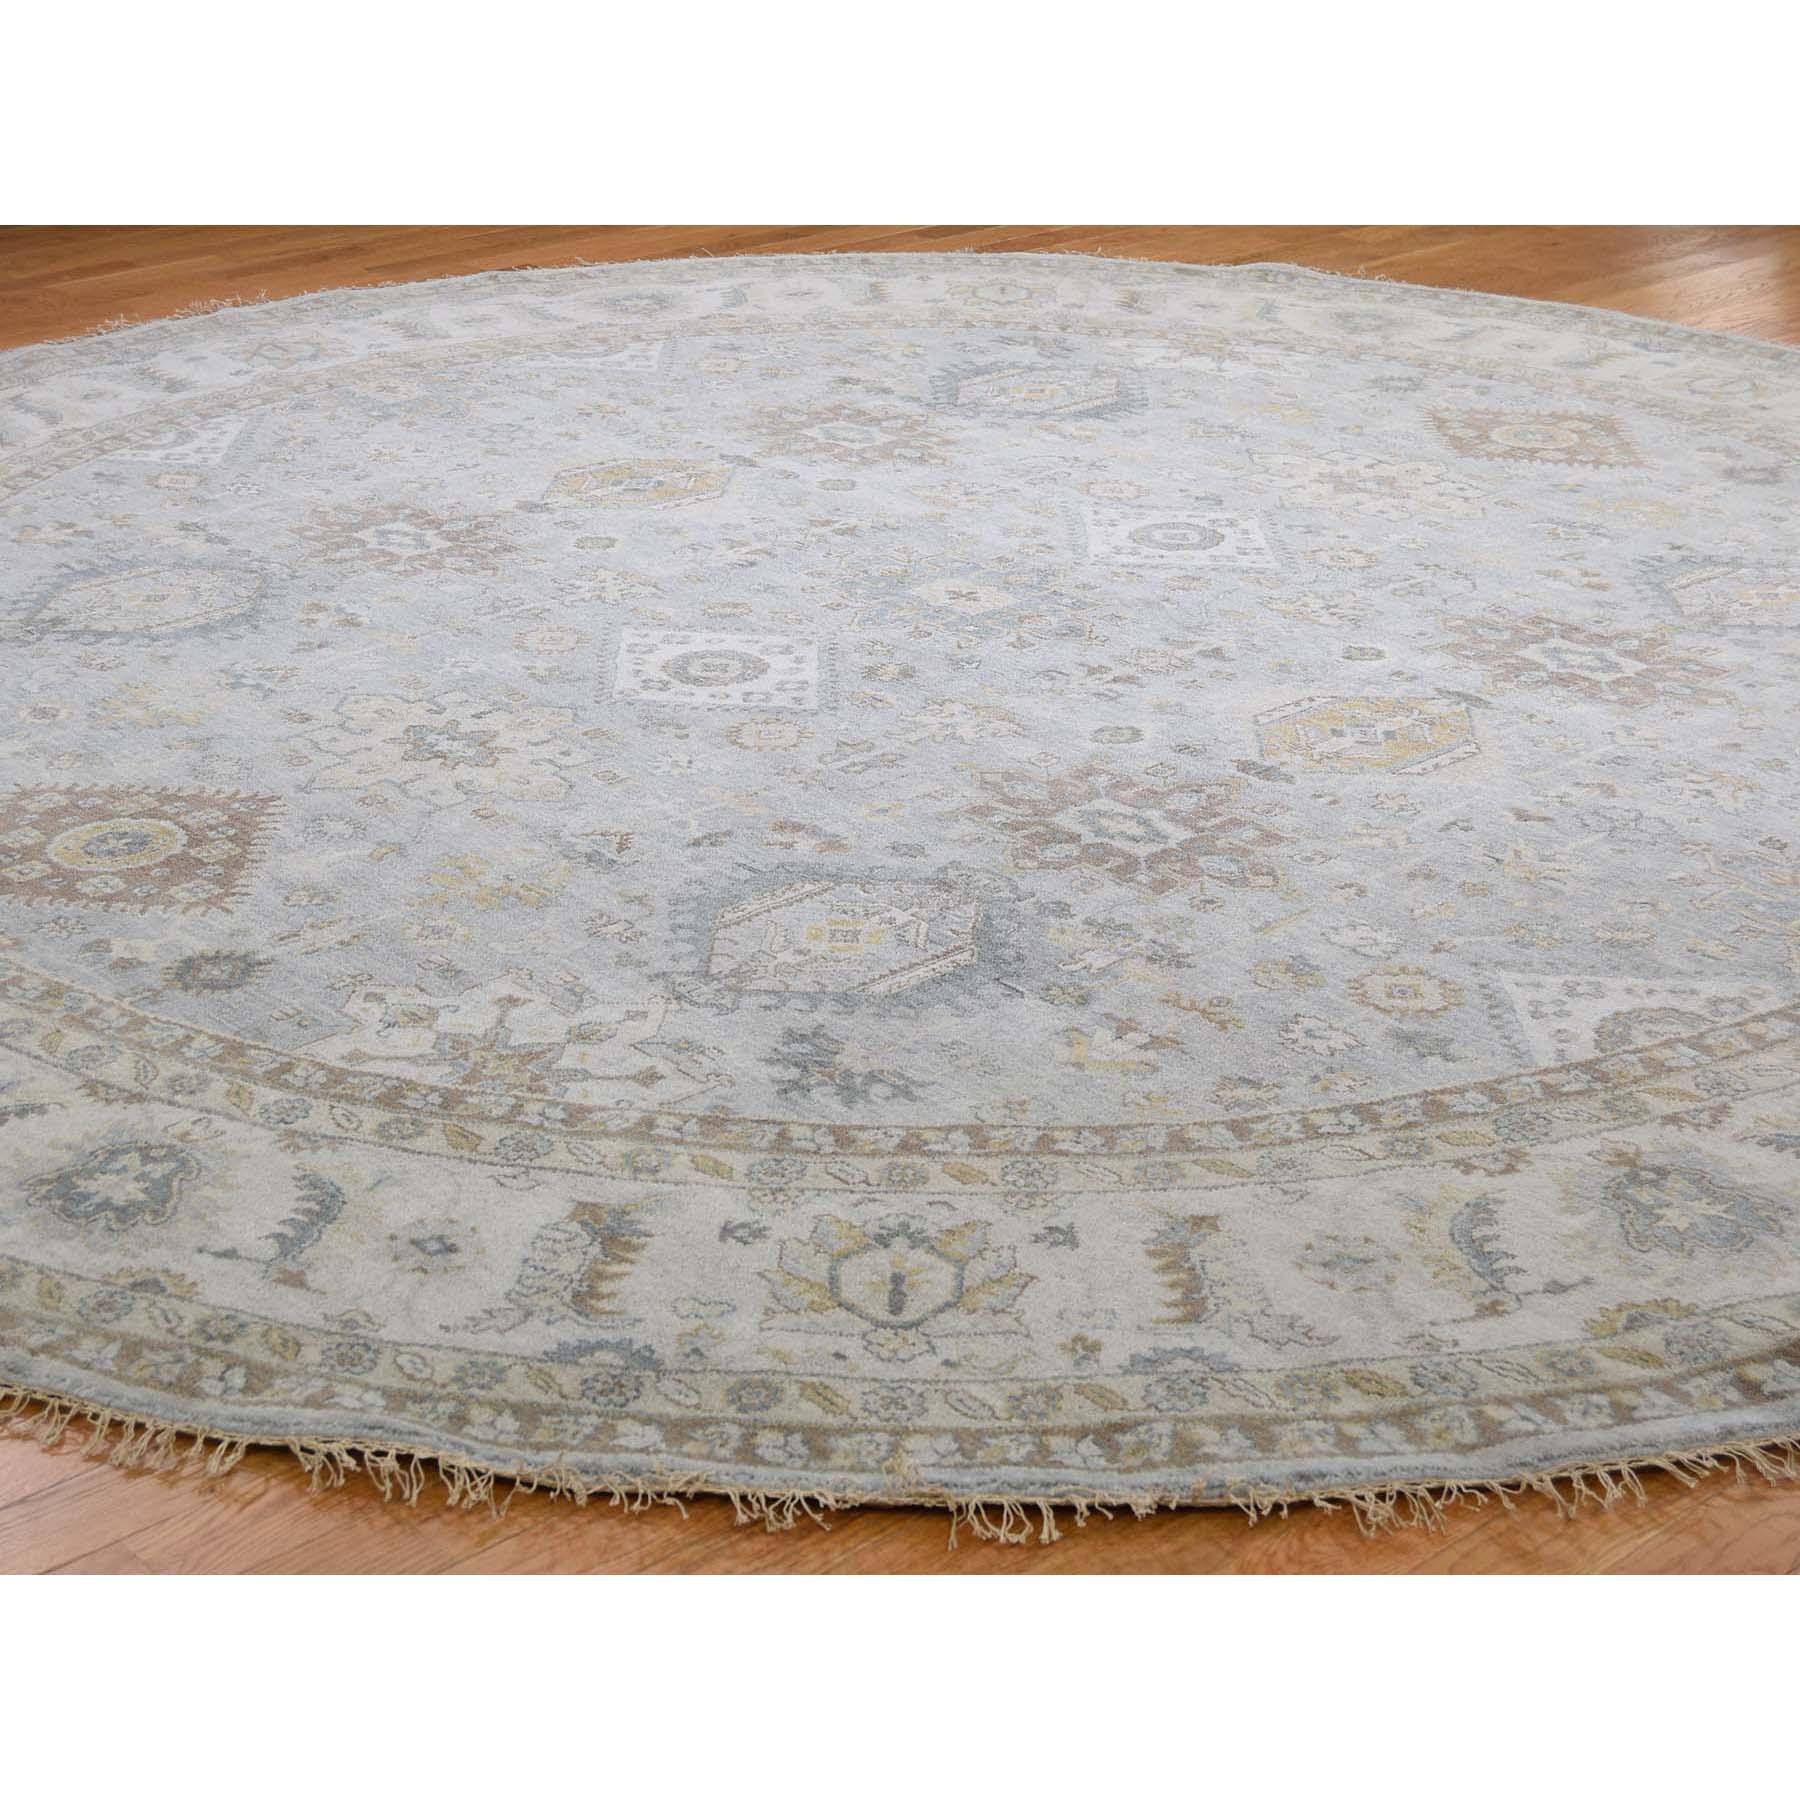 8-x8- Hand-Knotted Karajeh 100 Percent Wool Oriental Round Rug